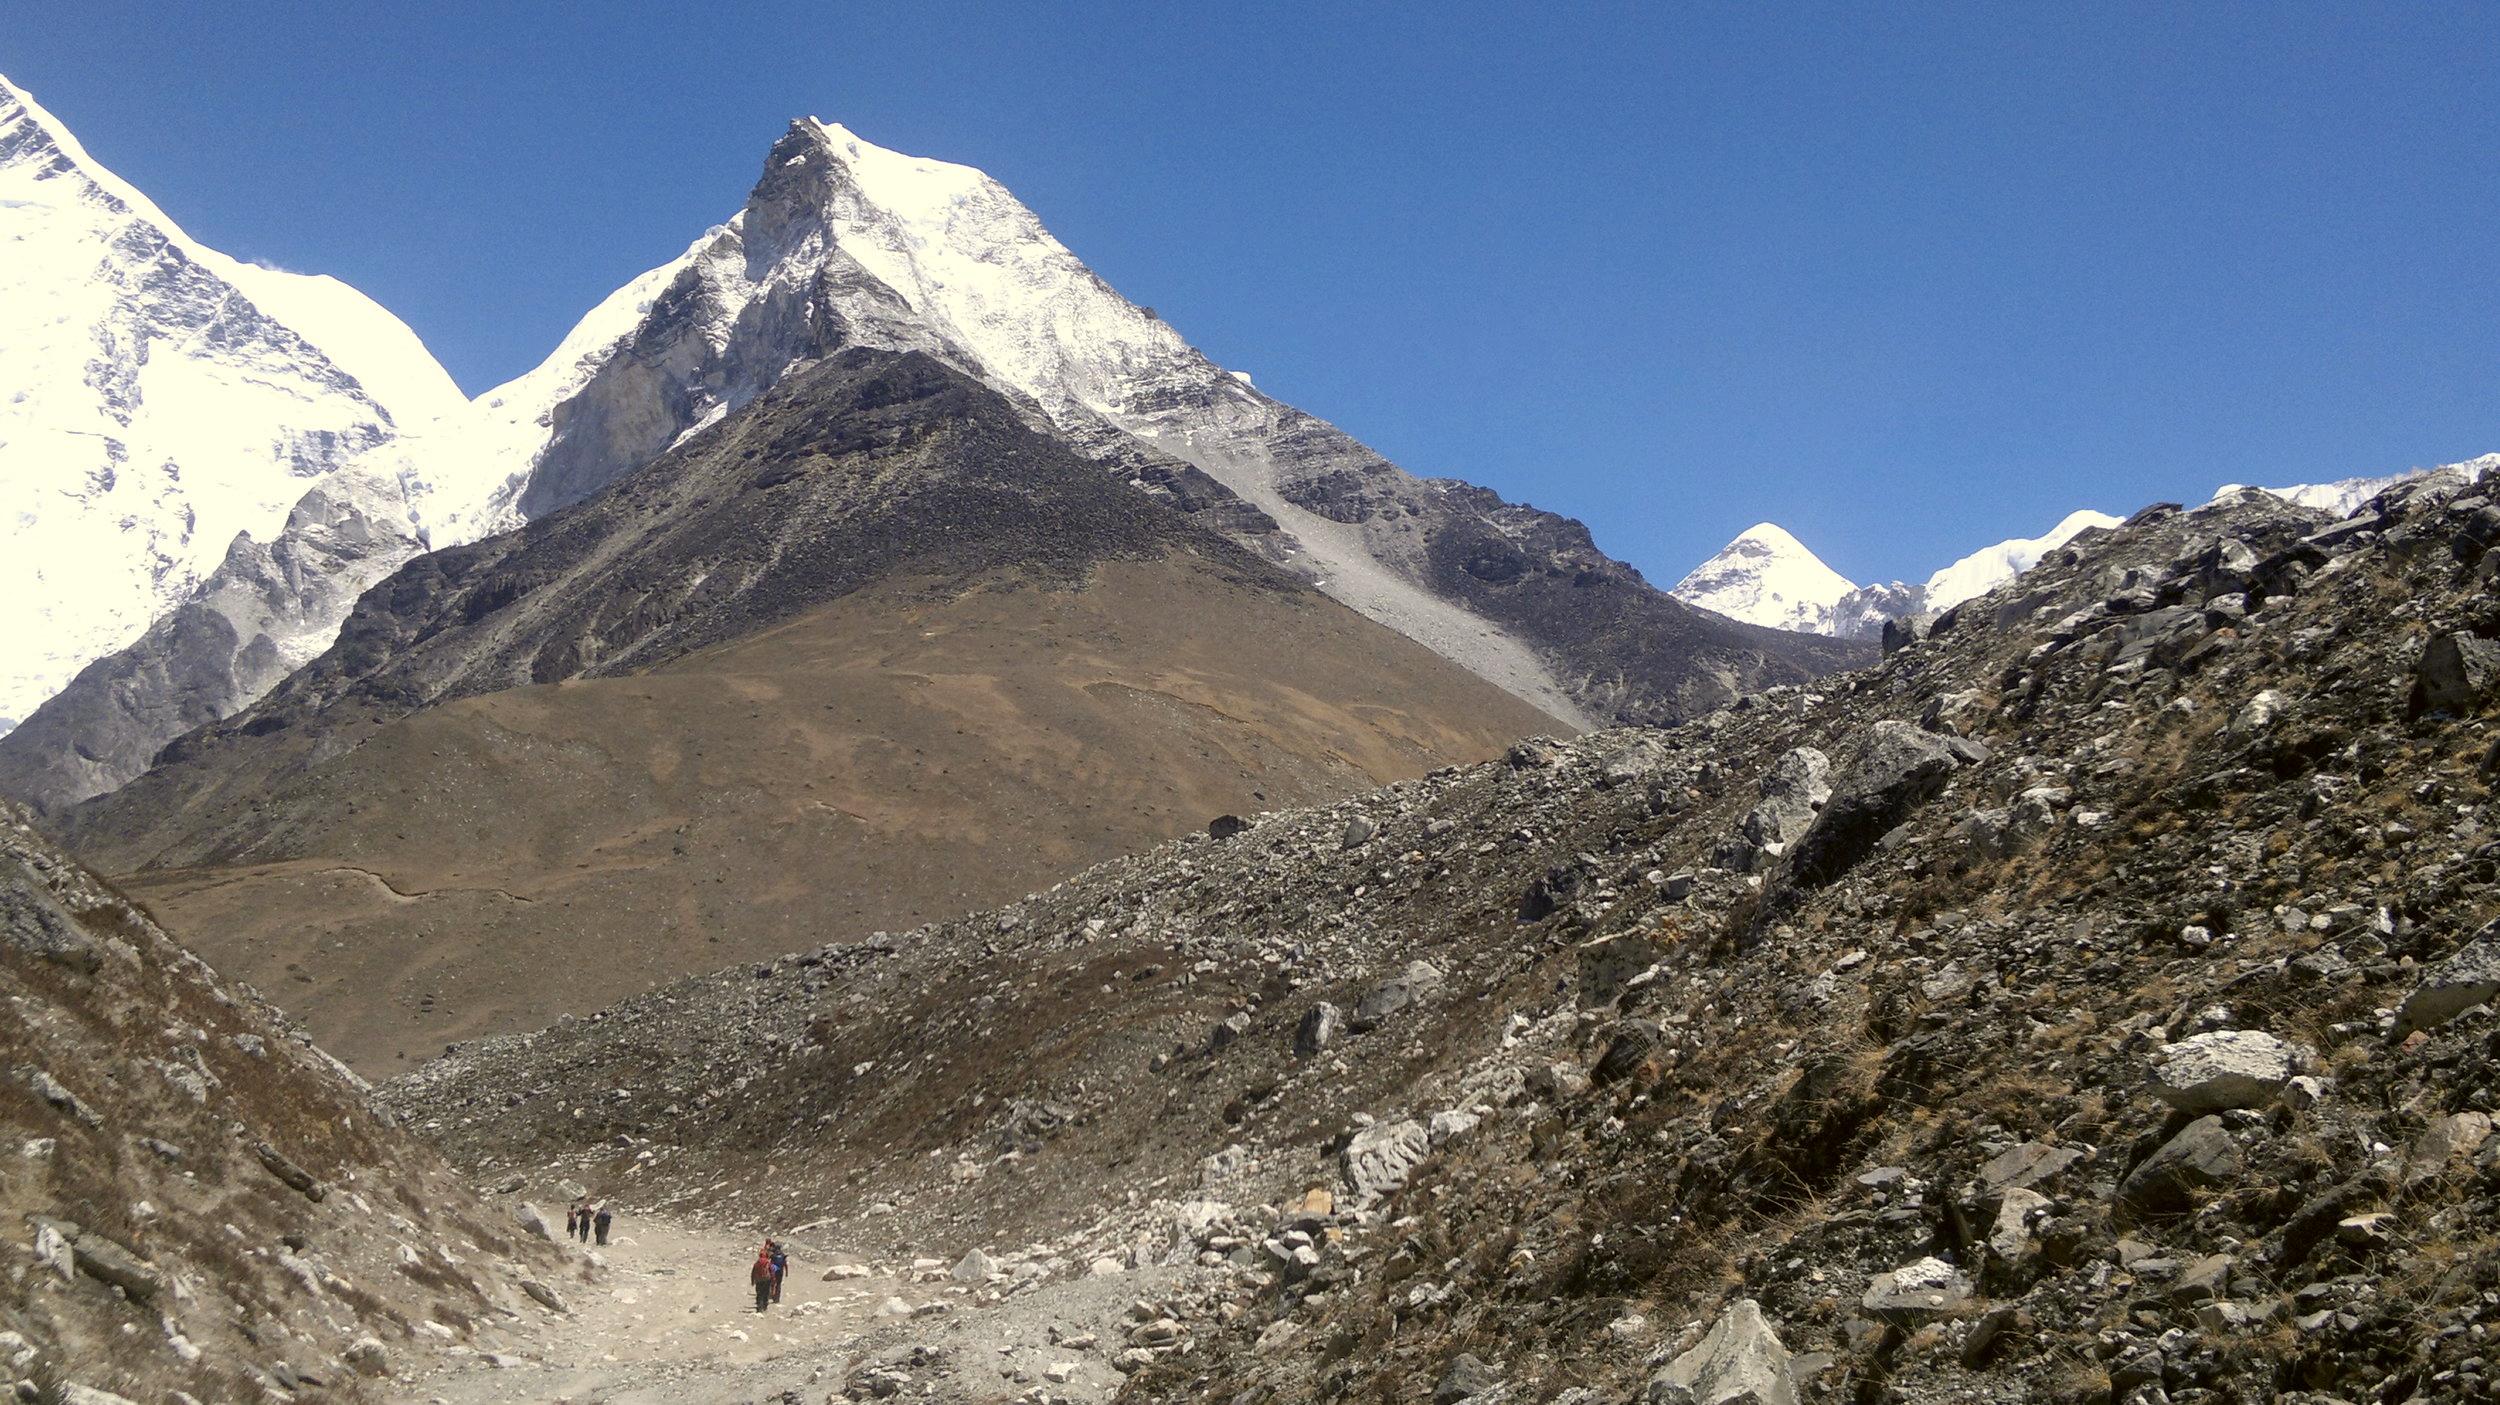 Trekking to Island Peak with its visible ridge